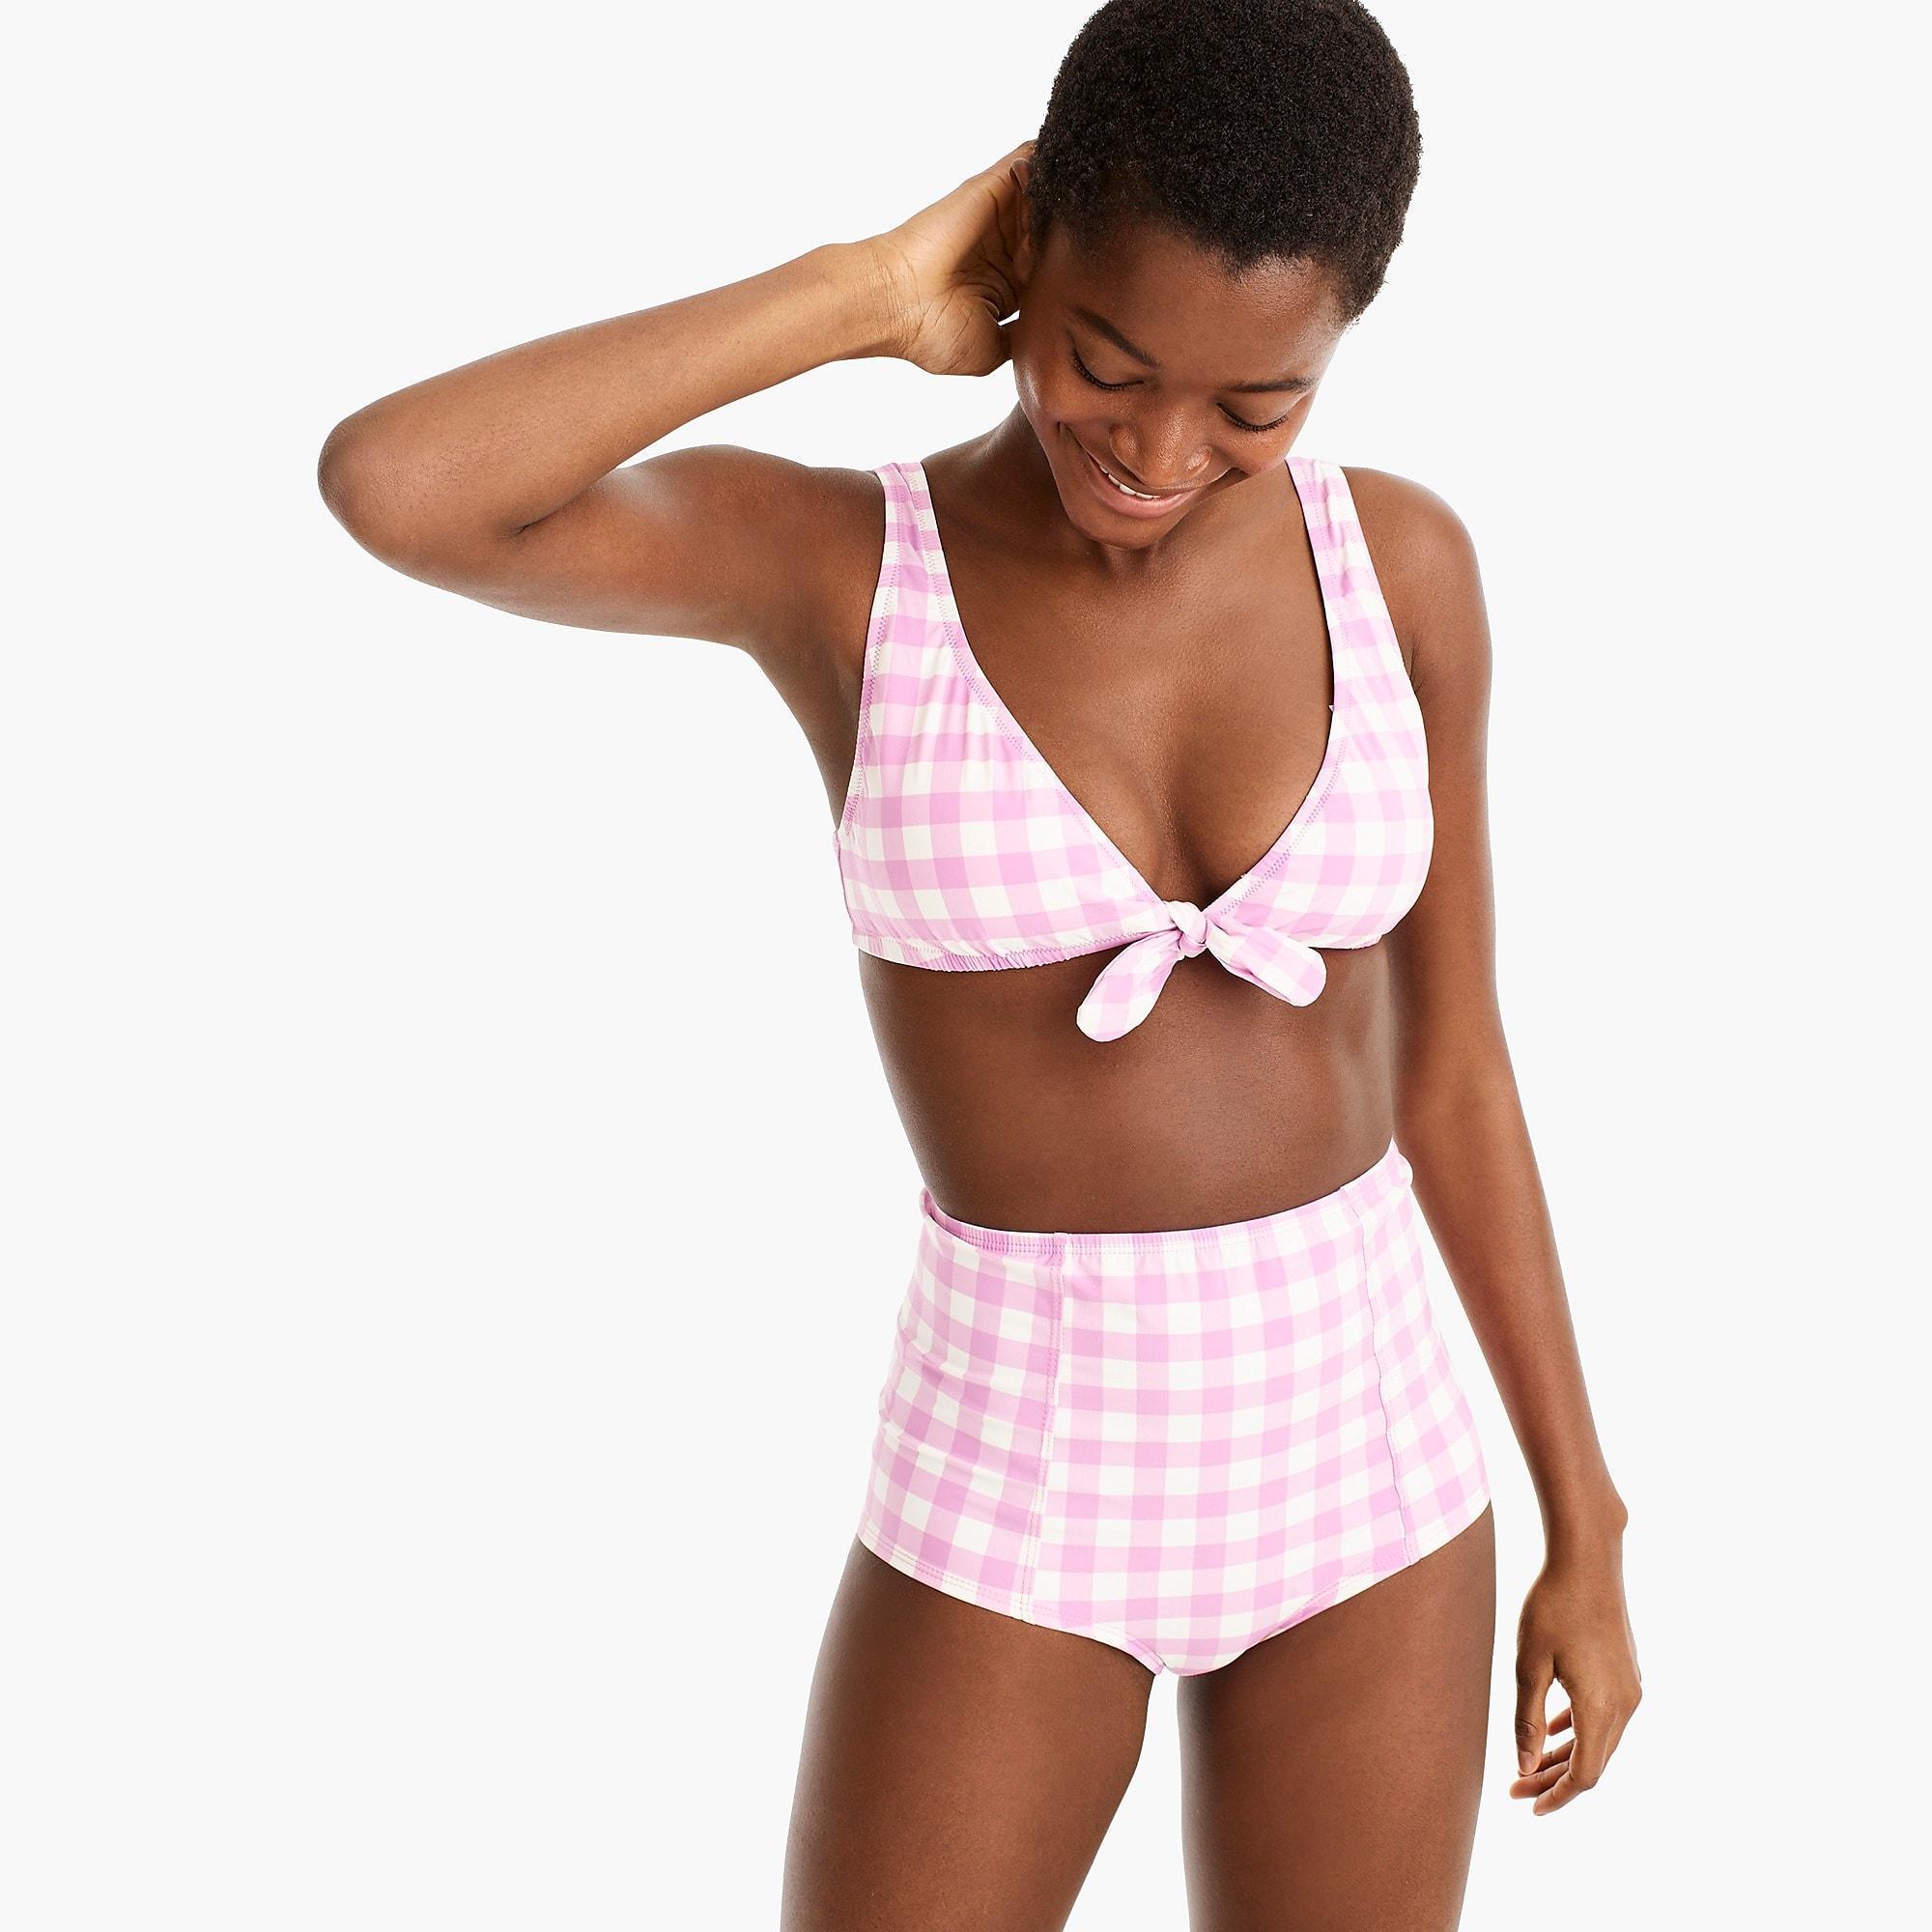 b8a395e49a991 J.Crew. Women s Tie-front Scoopback Bikini Top In Oversized Matte Gingham